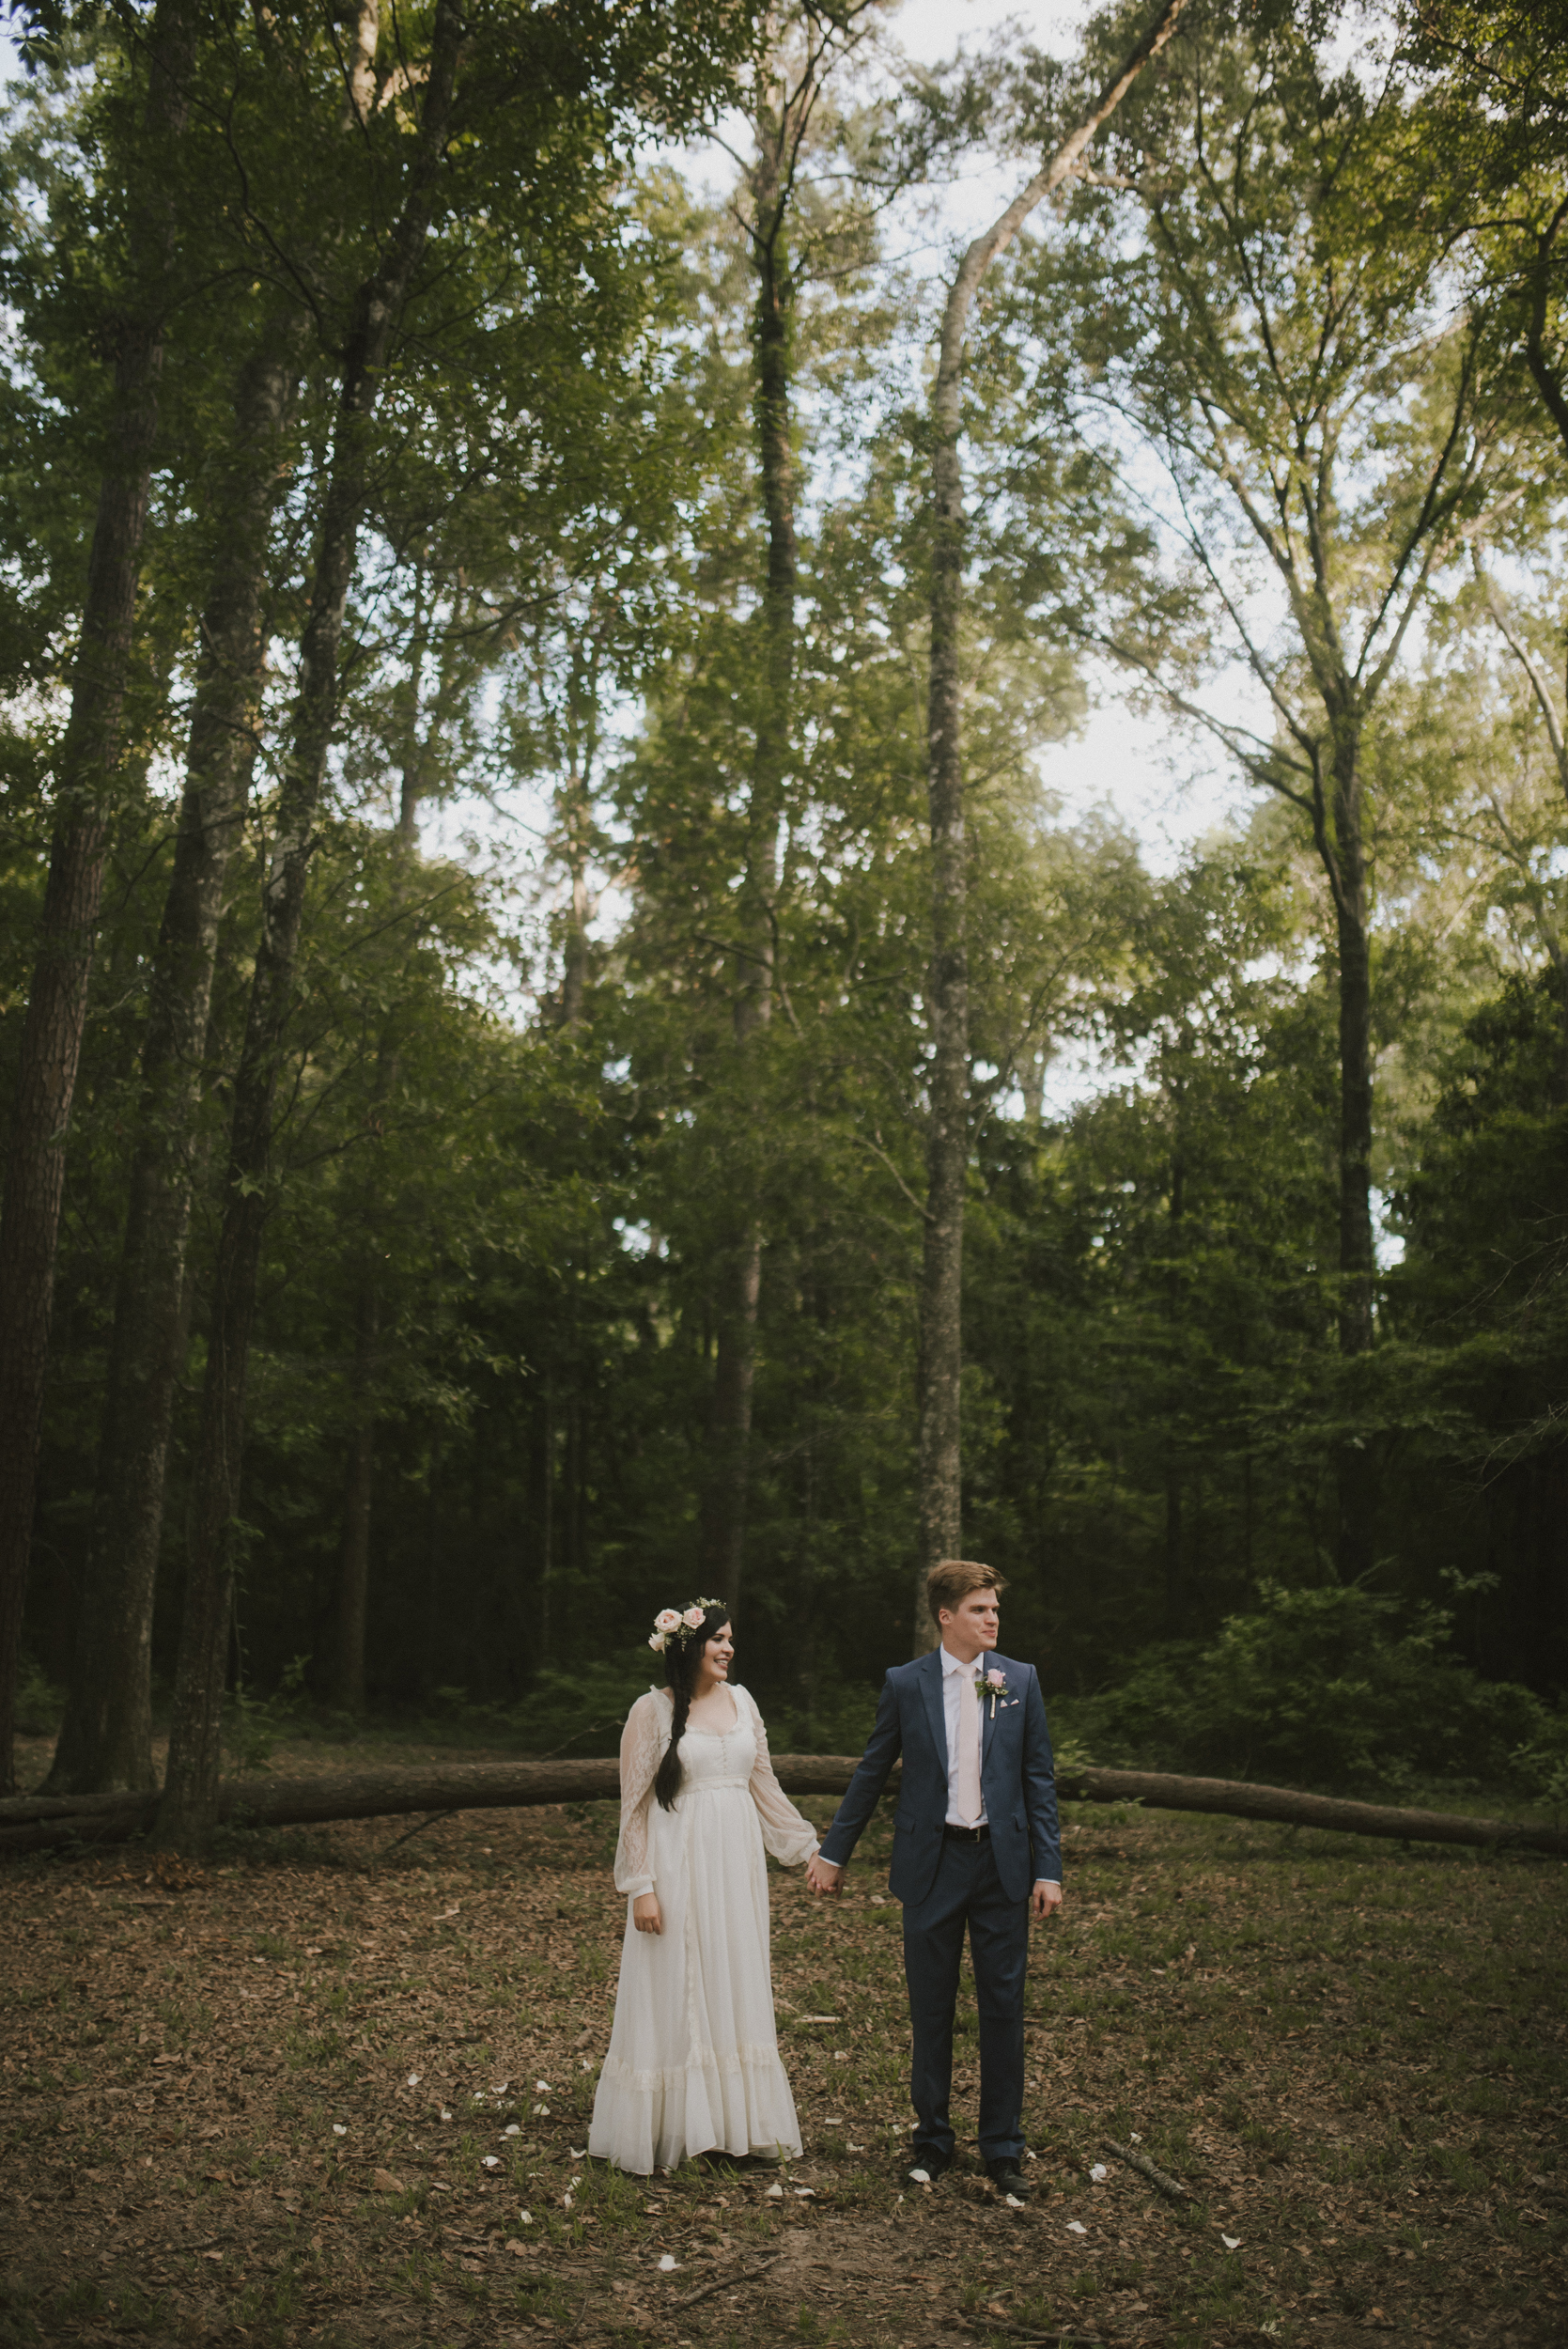 ofRen_weddingphotographer-147.jpg